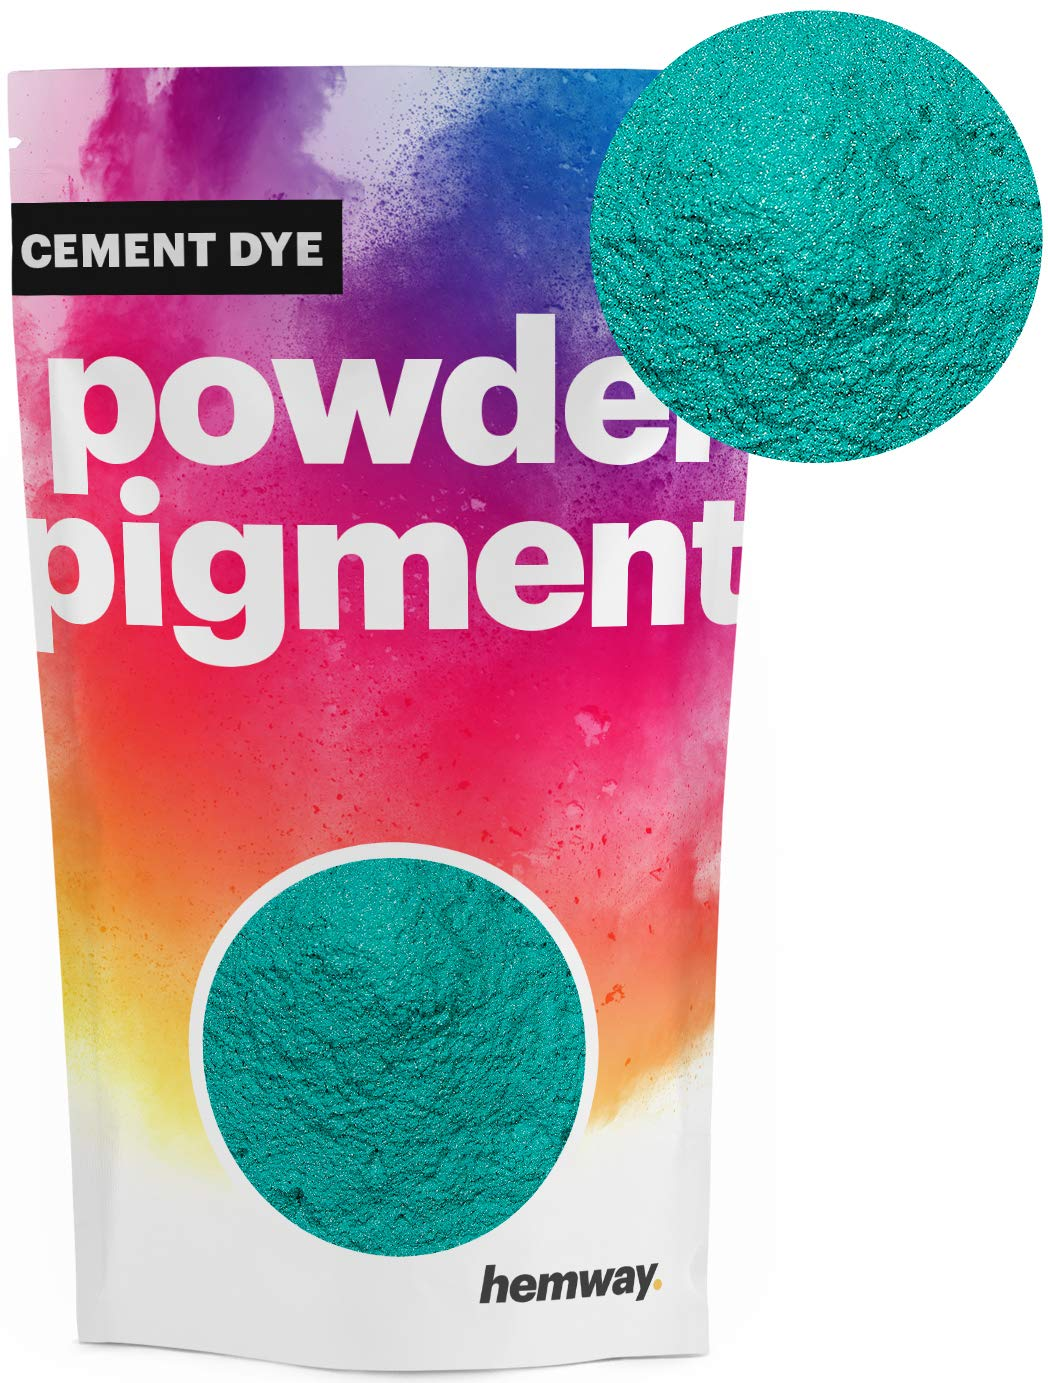 Hemway Cement Dye Powder Pigment Concrete Color Render Mortar Pointing Powdered Brick Toner Plaster (100g / 3.5oz, Metallic Jade Green)